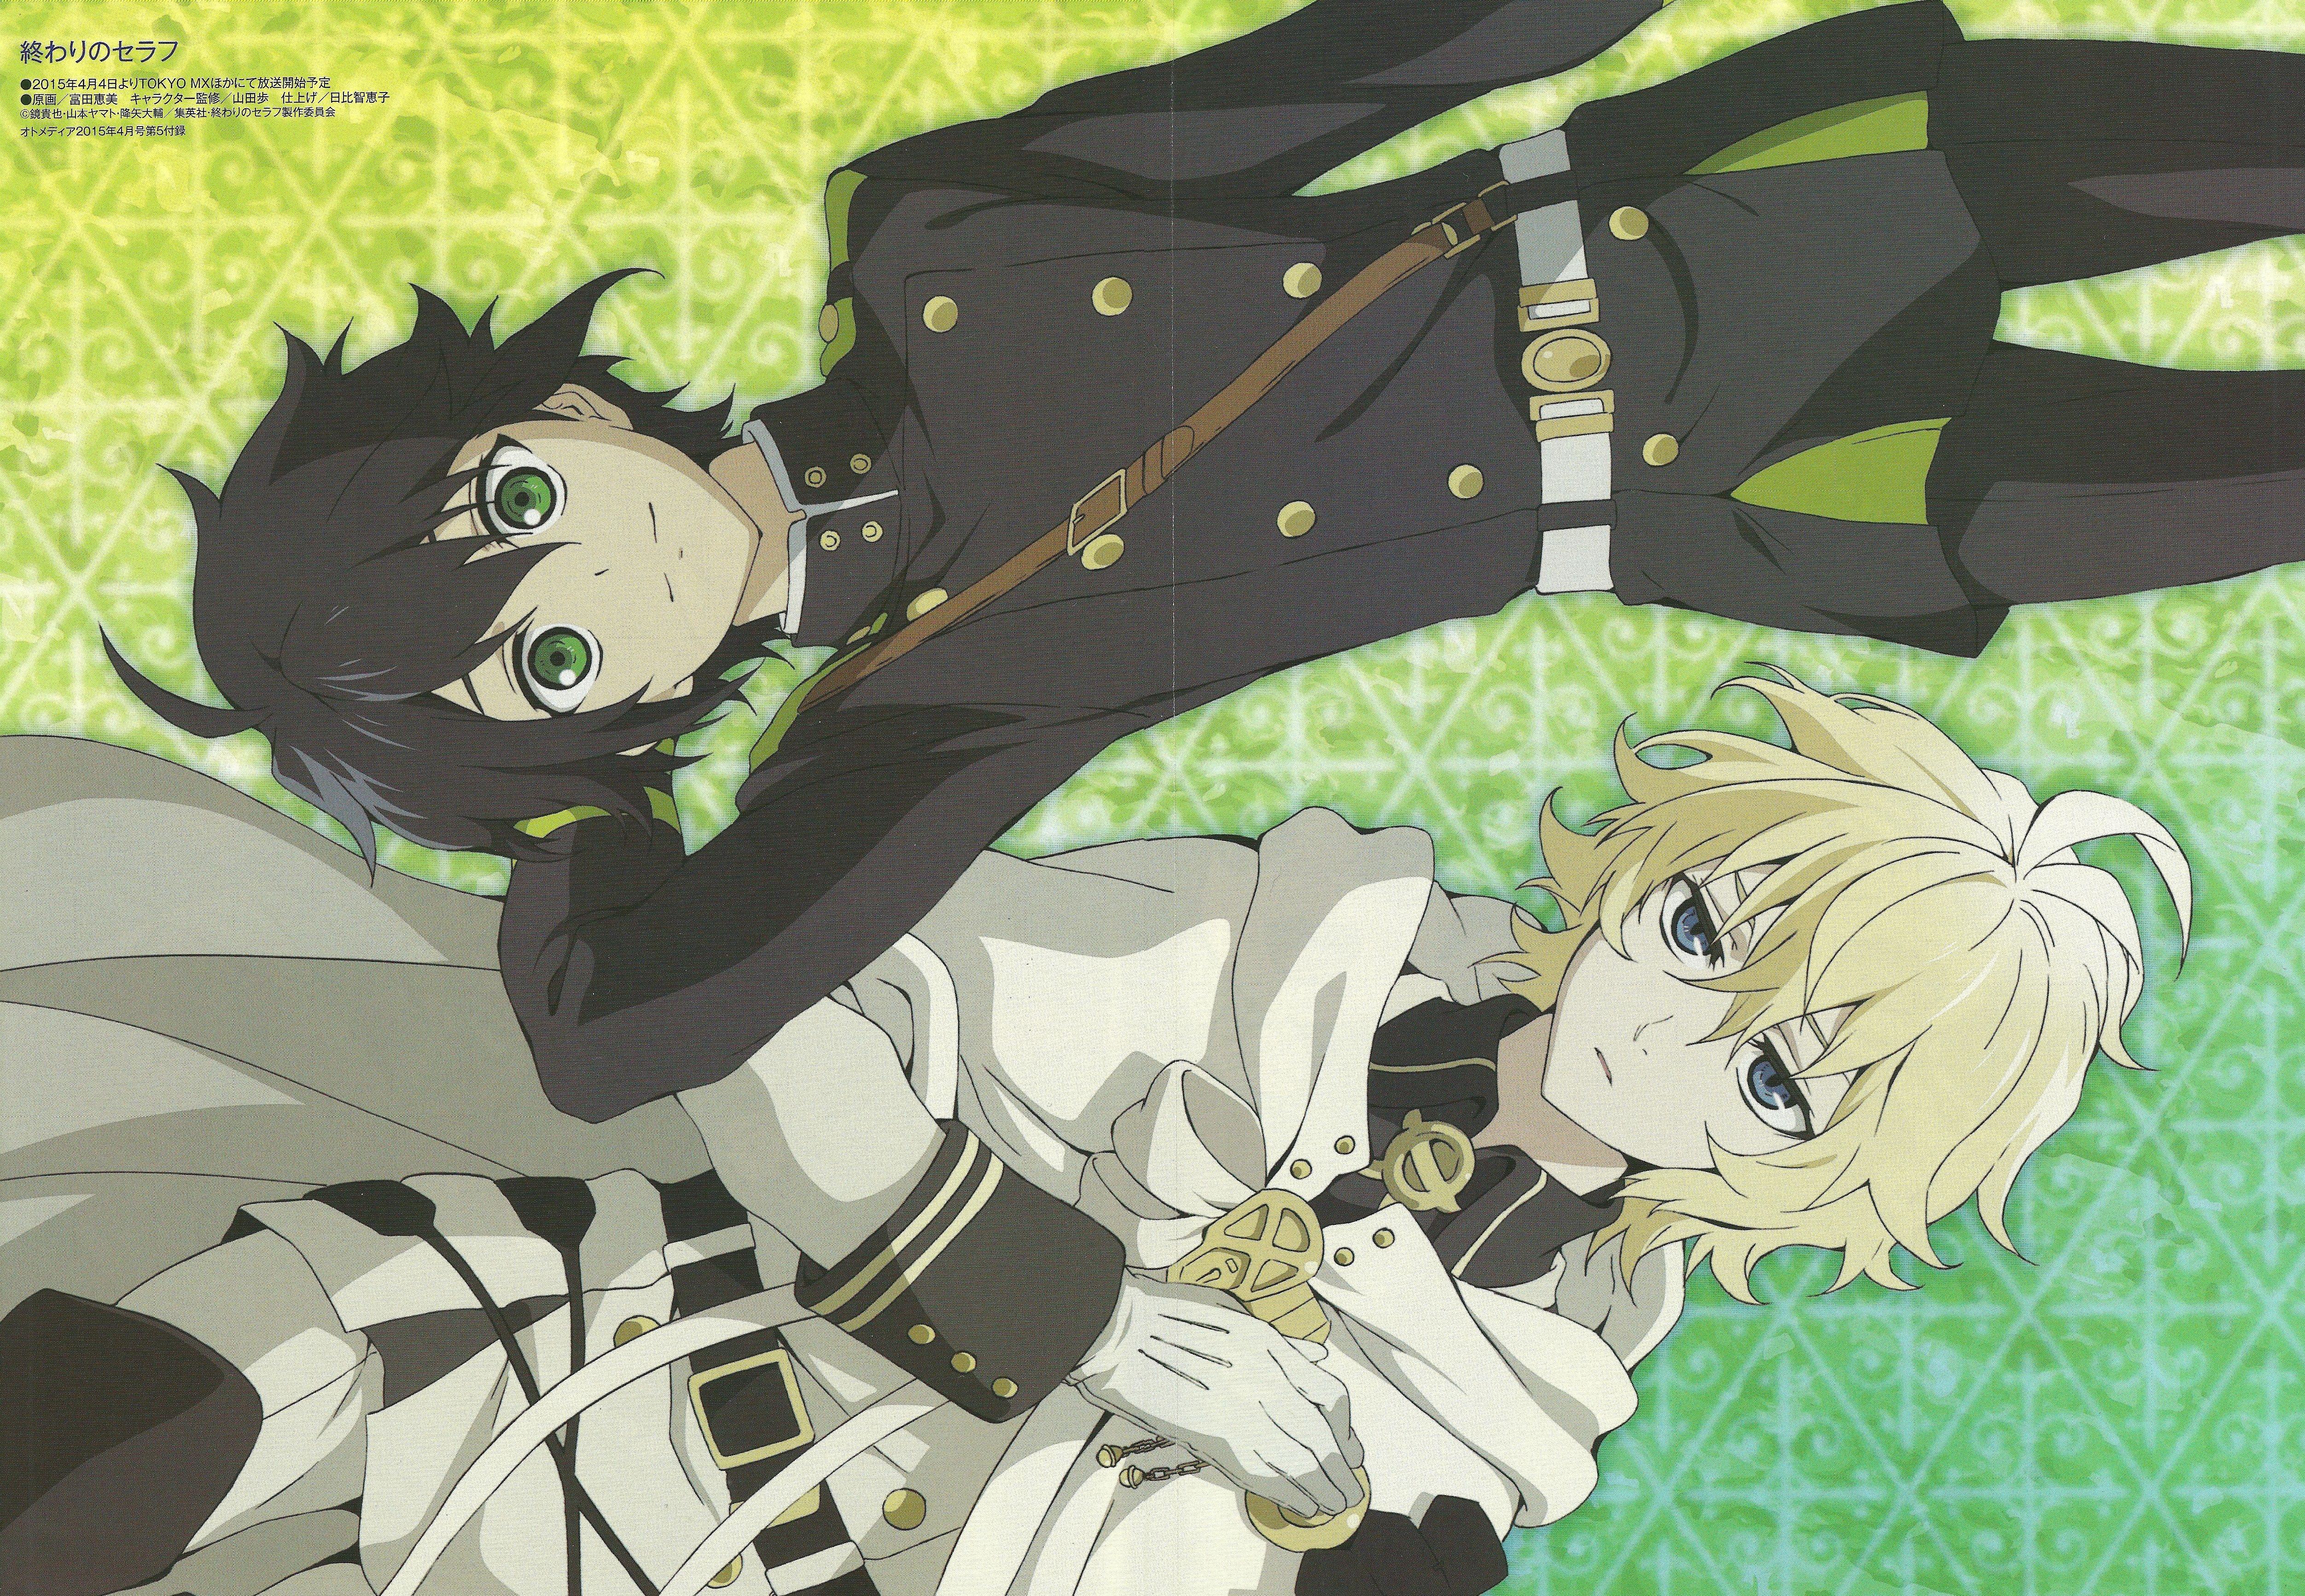 Owari no Seraph Wallpaper anime by corphish2.deviantart